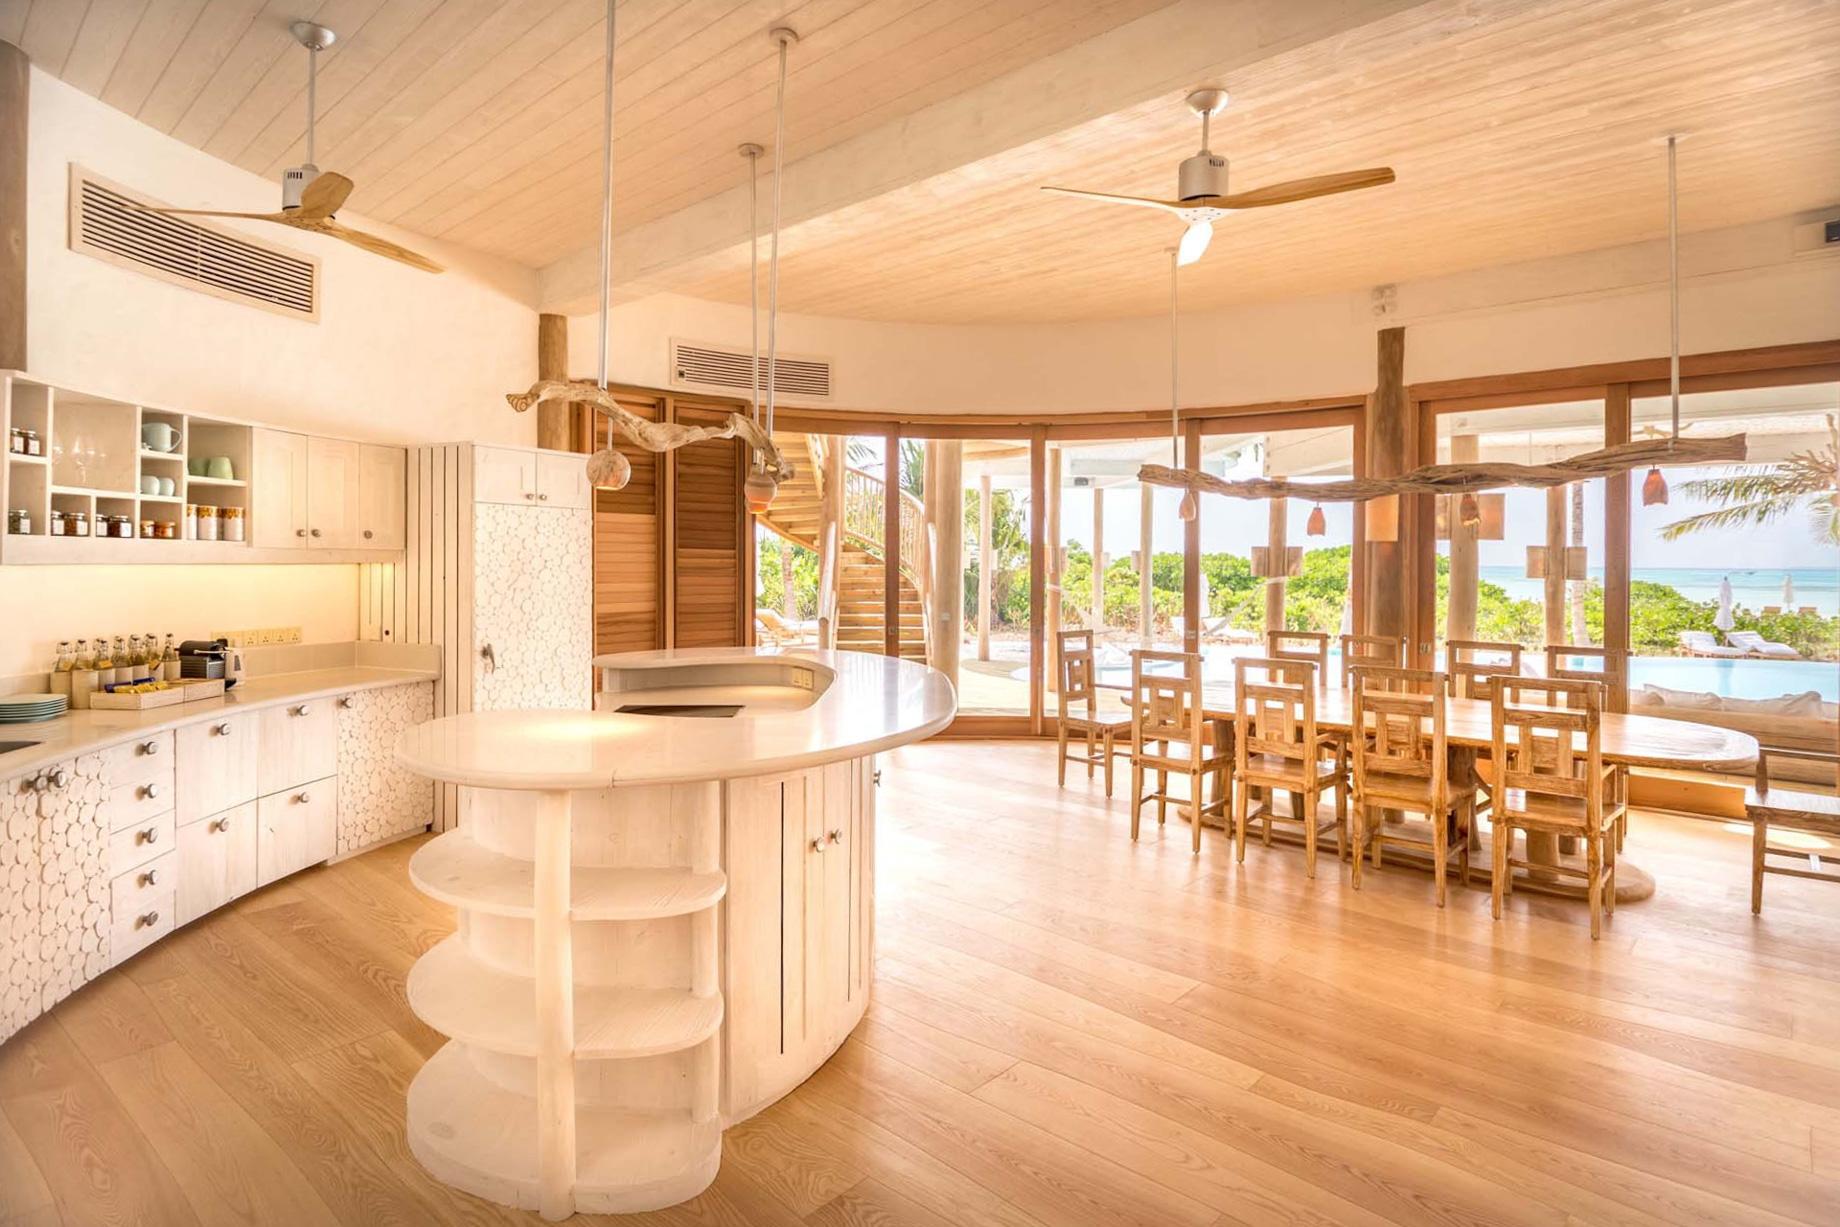 Soneva Jani Luxury Resort – Noonu Atoll, Medhufaru, Maldives – 3 Bedroom Island Reserve Villa Kitchen